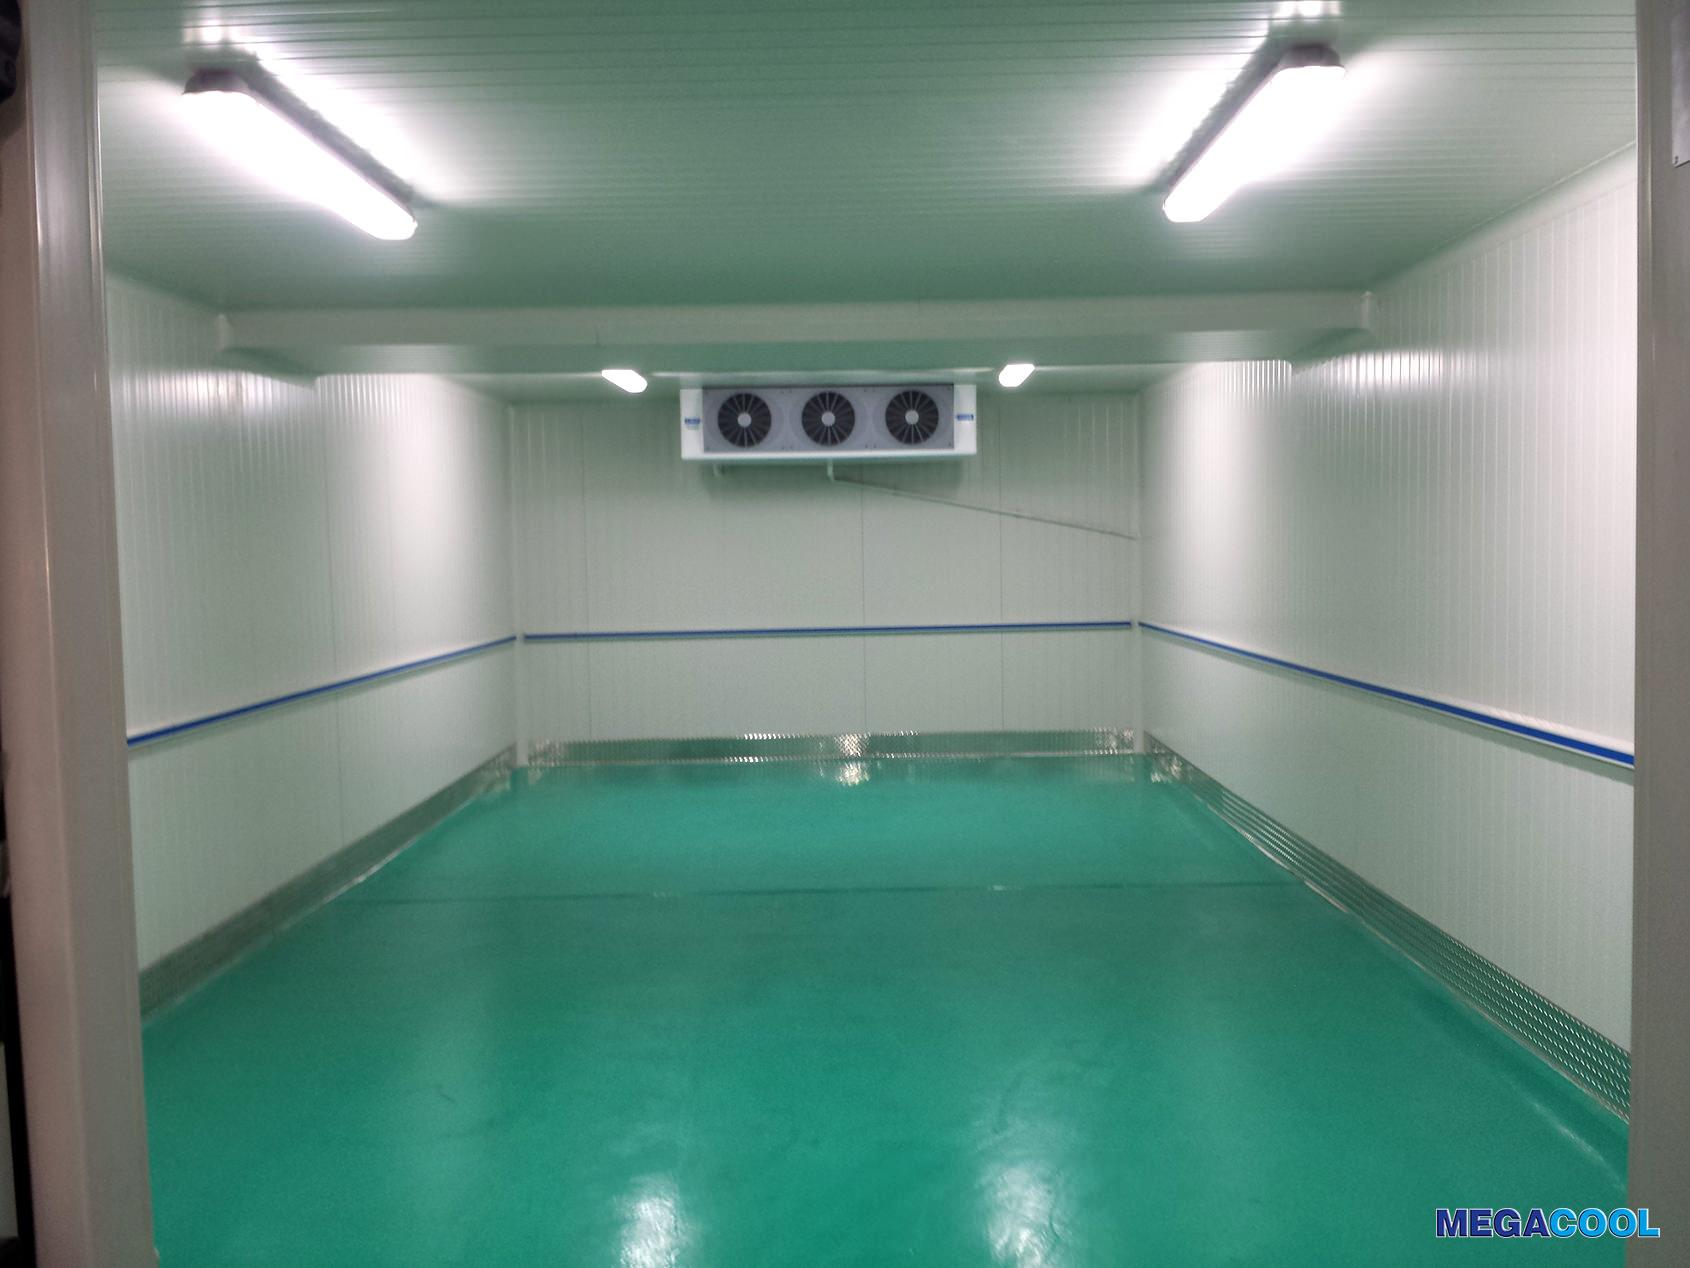 MegaCool-Επαγγελματική-ψύξη-Professional-refrigeration-ΑΣΕΠΟΠ-ΝΑΟΥΣΑΣ-ASEPOP-NAOUSAS-Κατασκευή-ψυκτικού-θαλάμου-Refrigeration-chamber-construction-Κατασκευή-τουαλέτας-Toilet-construction-Κατασκευή-γραφείου-Office-construction-Ανανέωση-παλαιών-εγκαταστάσεων-Renewal-old-facilities